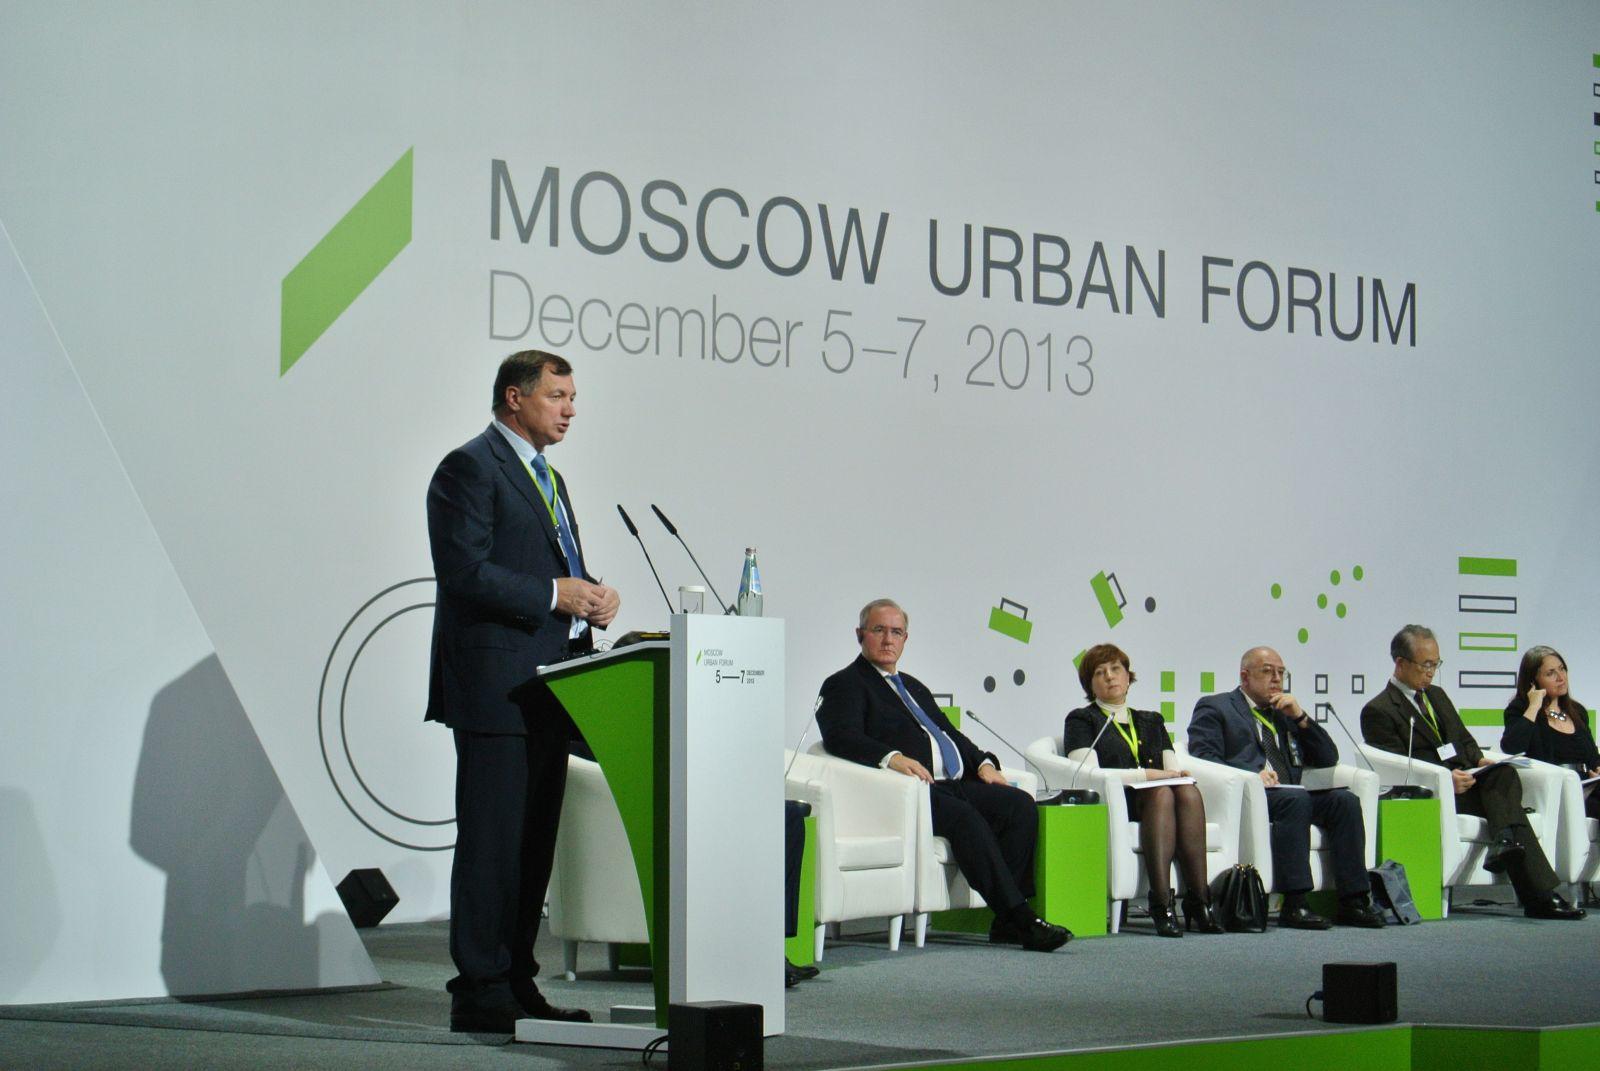 Moscow Urban Forum 2014